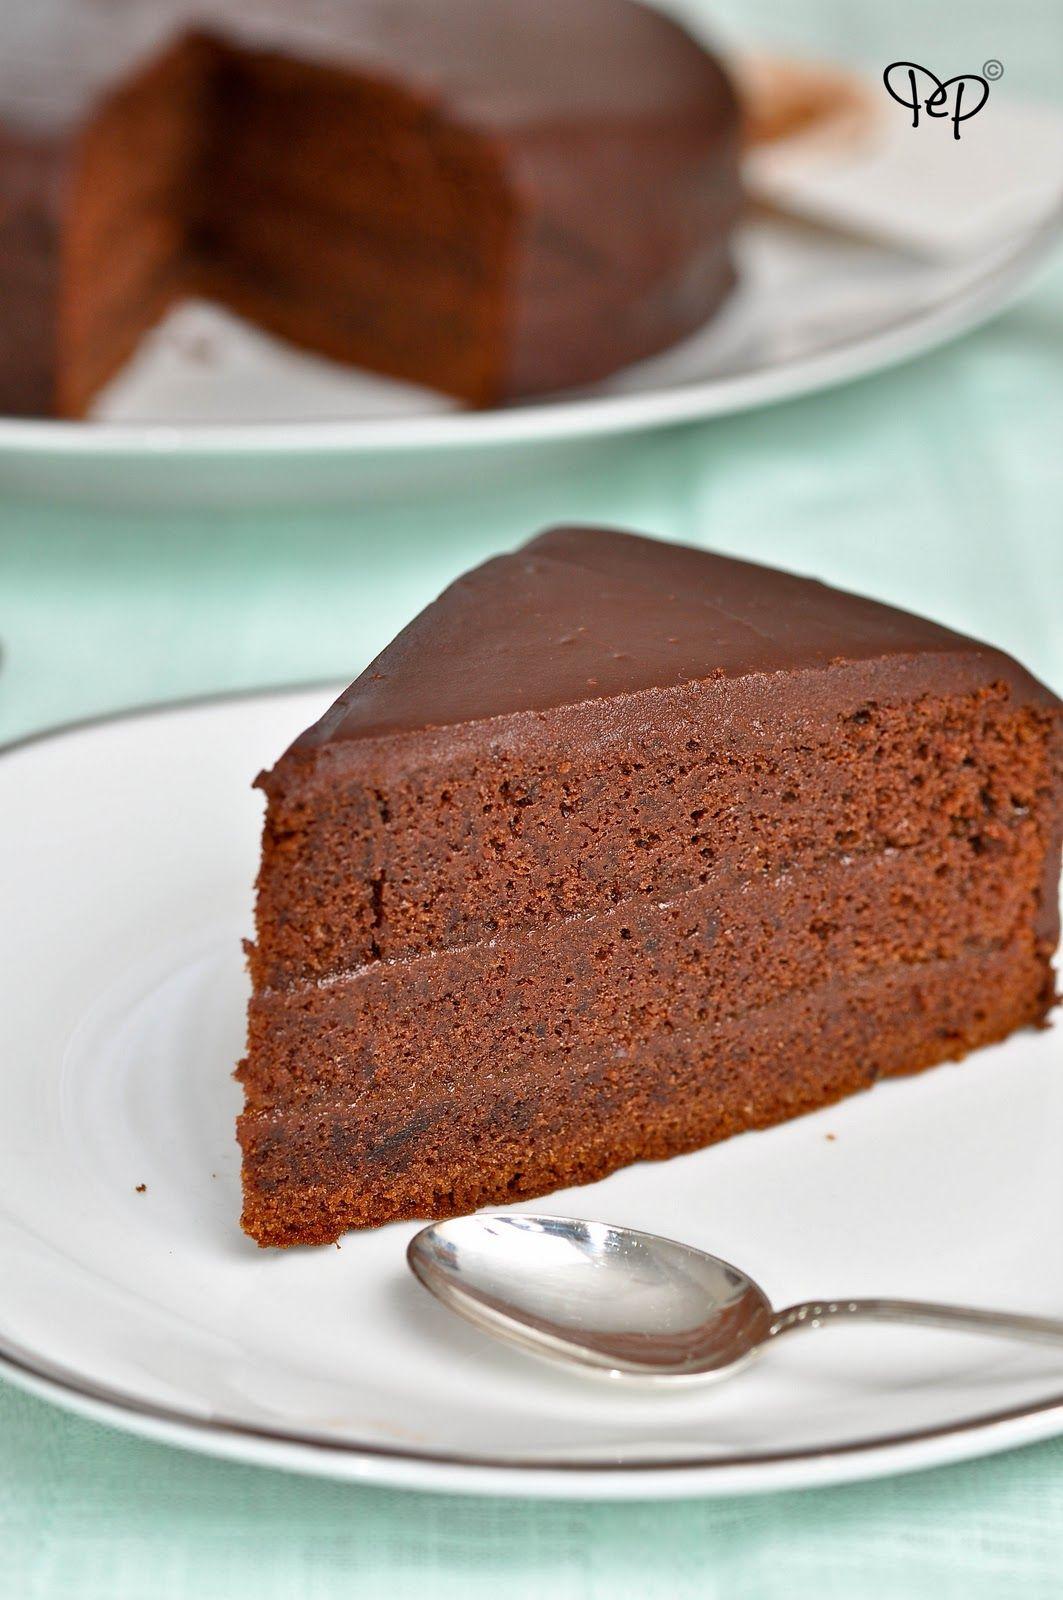 Caffe Nero Chocolate Fudge Cake Recipe